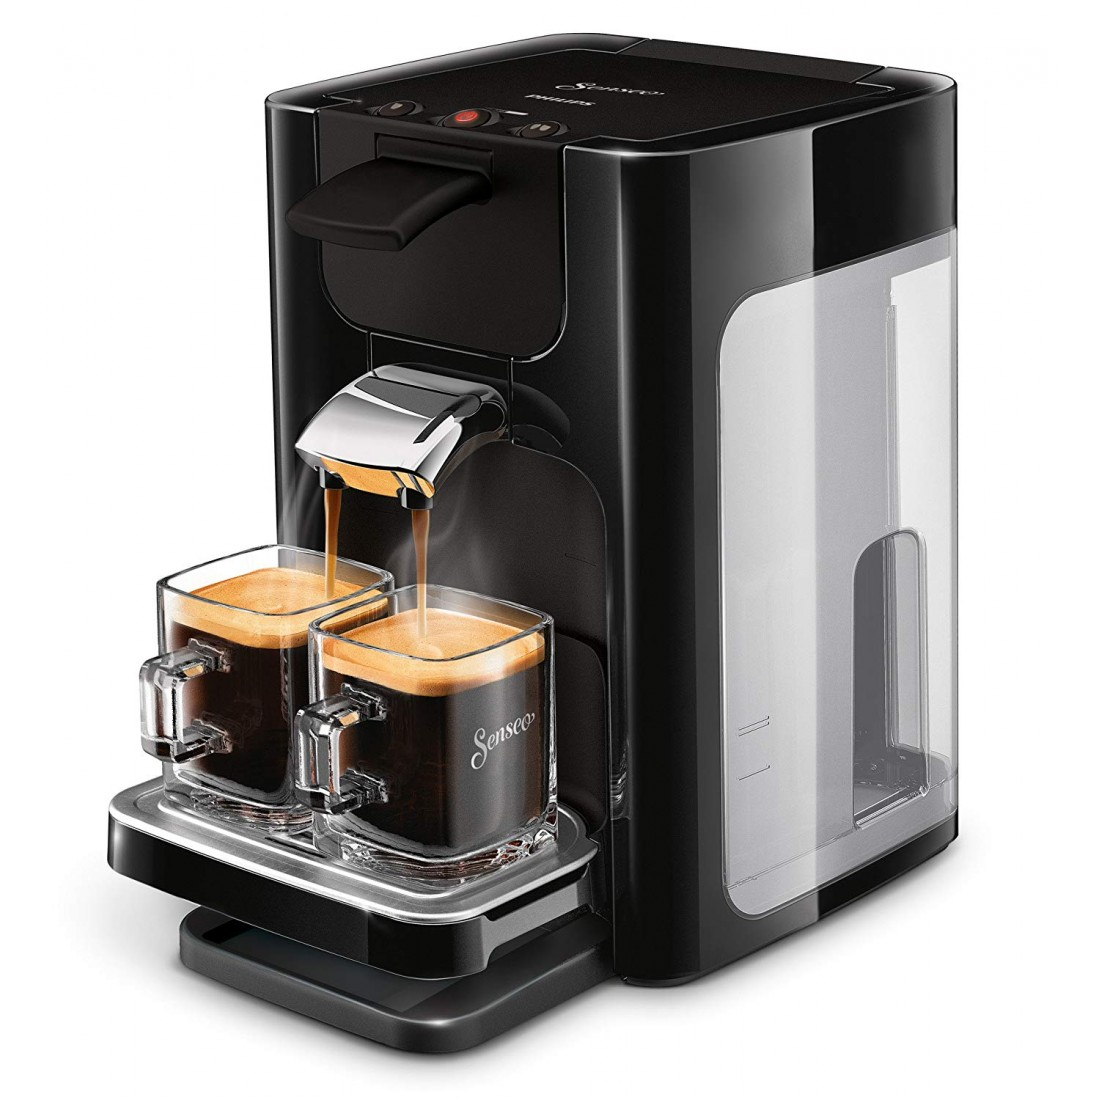 Máy pha cafe Philips Senseo Quadrante HD7865/60-Thế giới đồ gia